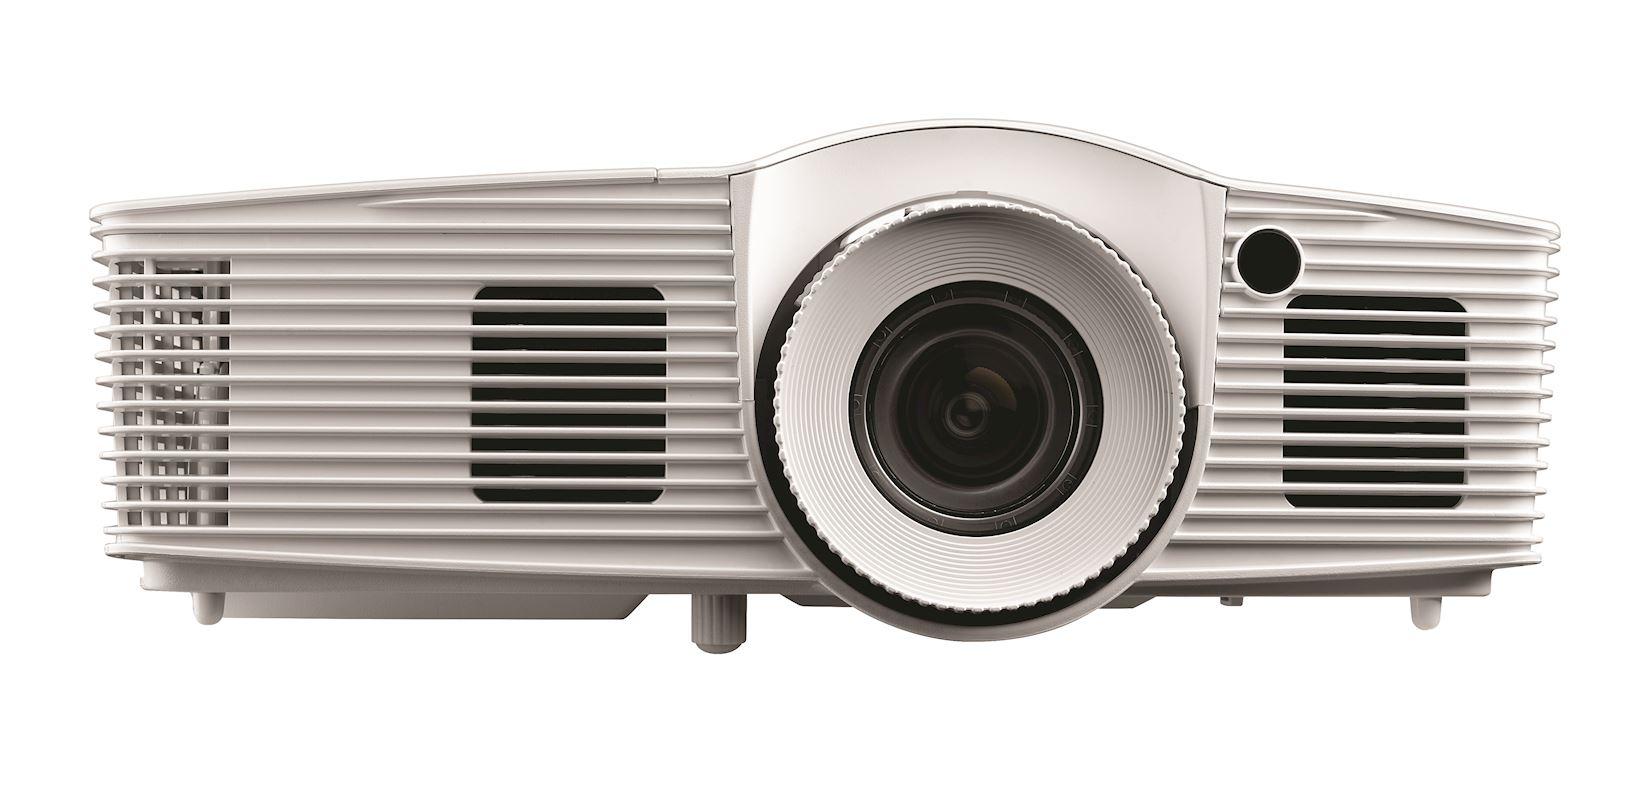 Videoproiector Optoma HD39 Darbee Full HD